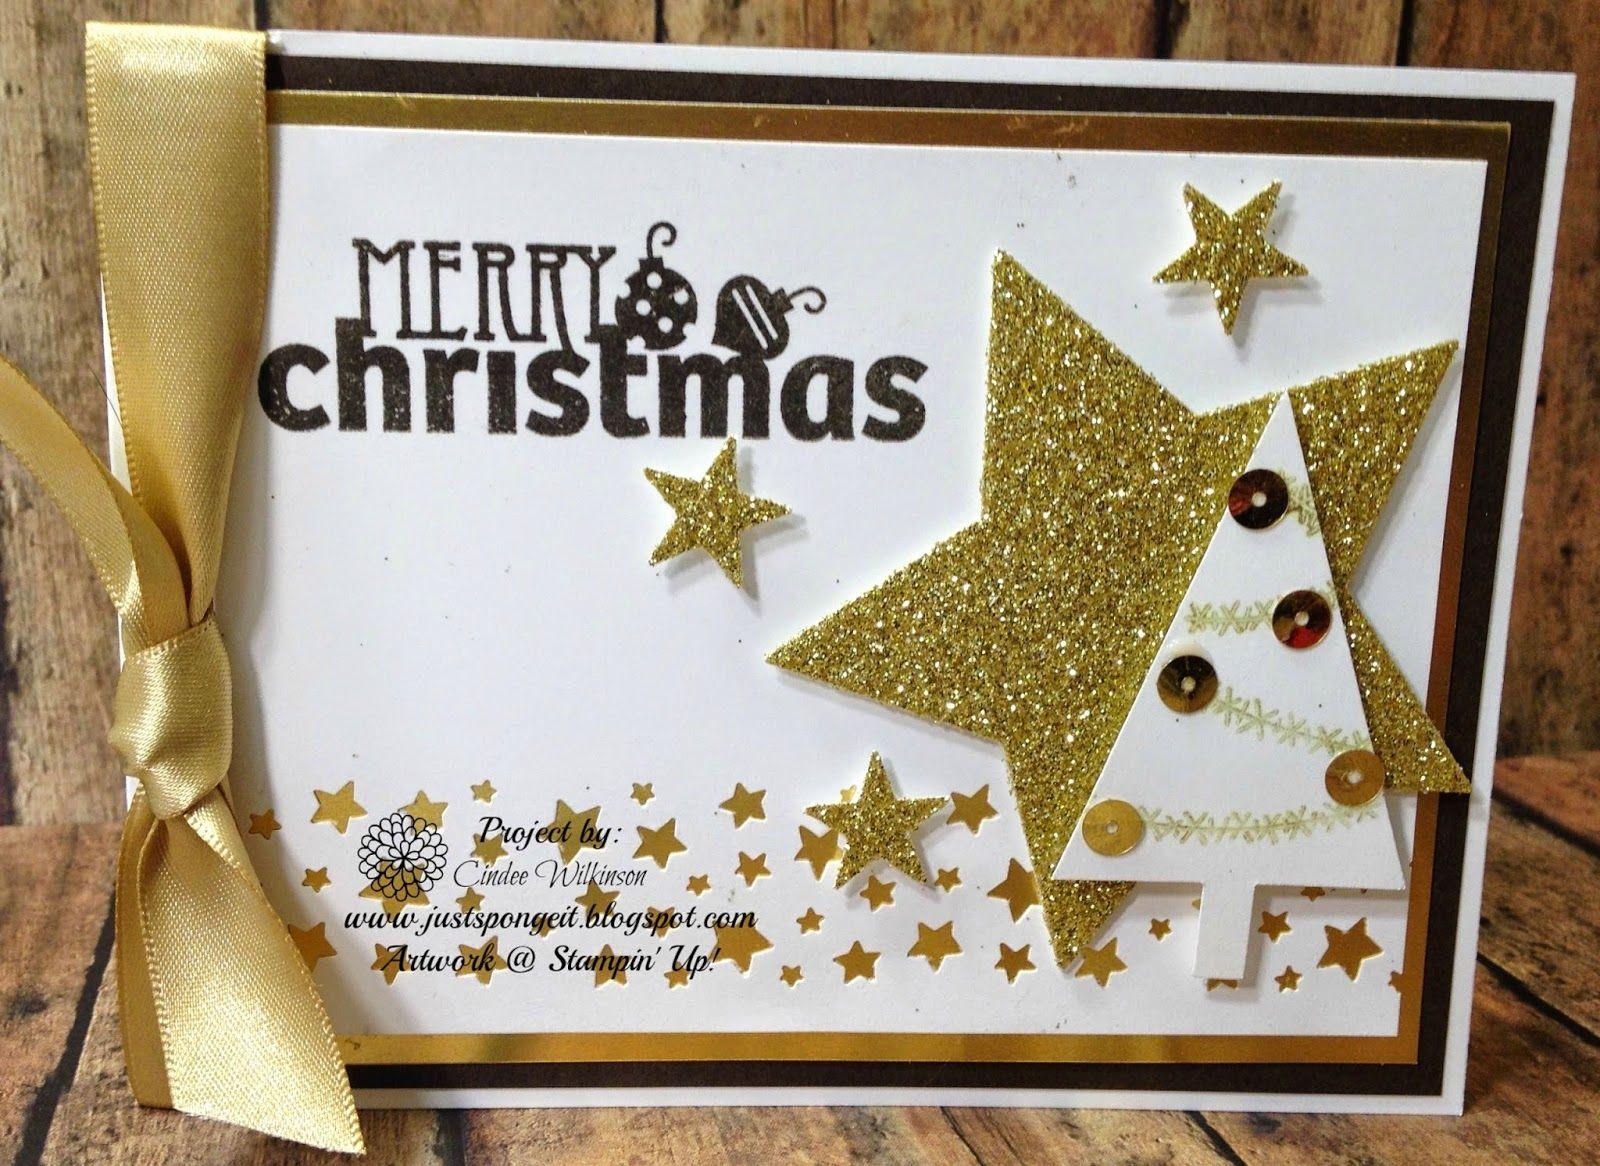 Just sponge it merry christmas club card christmas bliss stars just sponge it merry christmas club card christmas bliss stars framelits confetti kristyandbryce Images